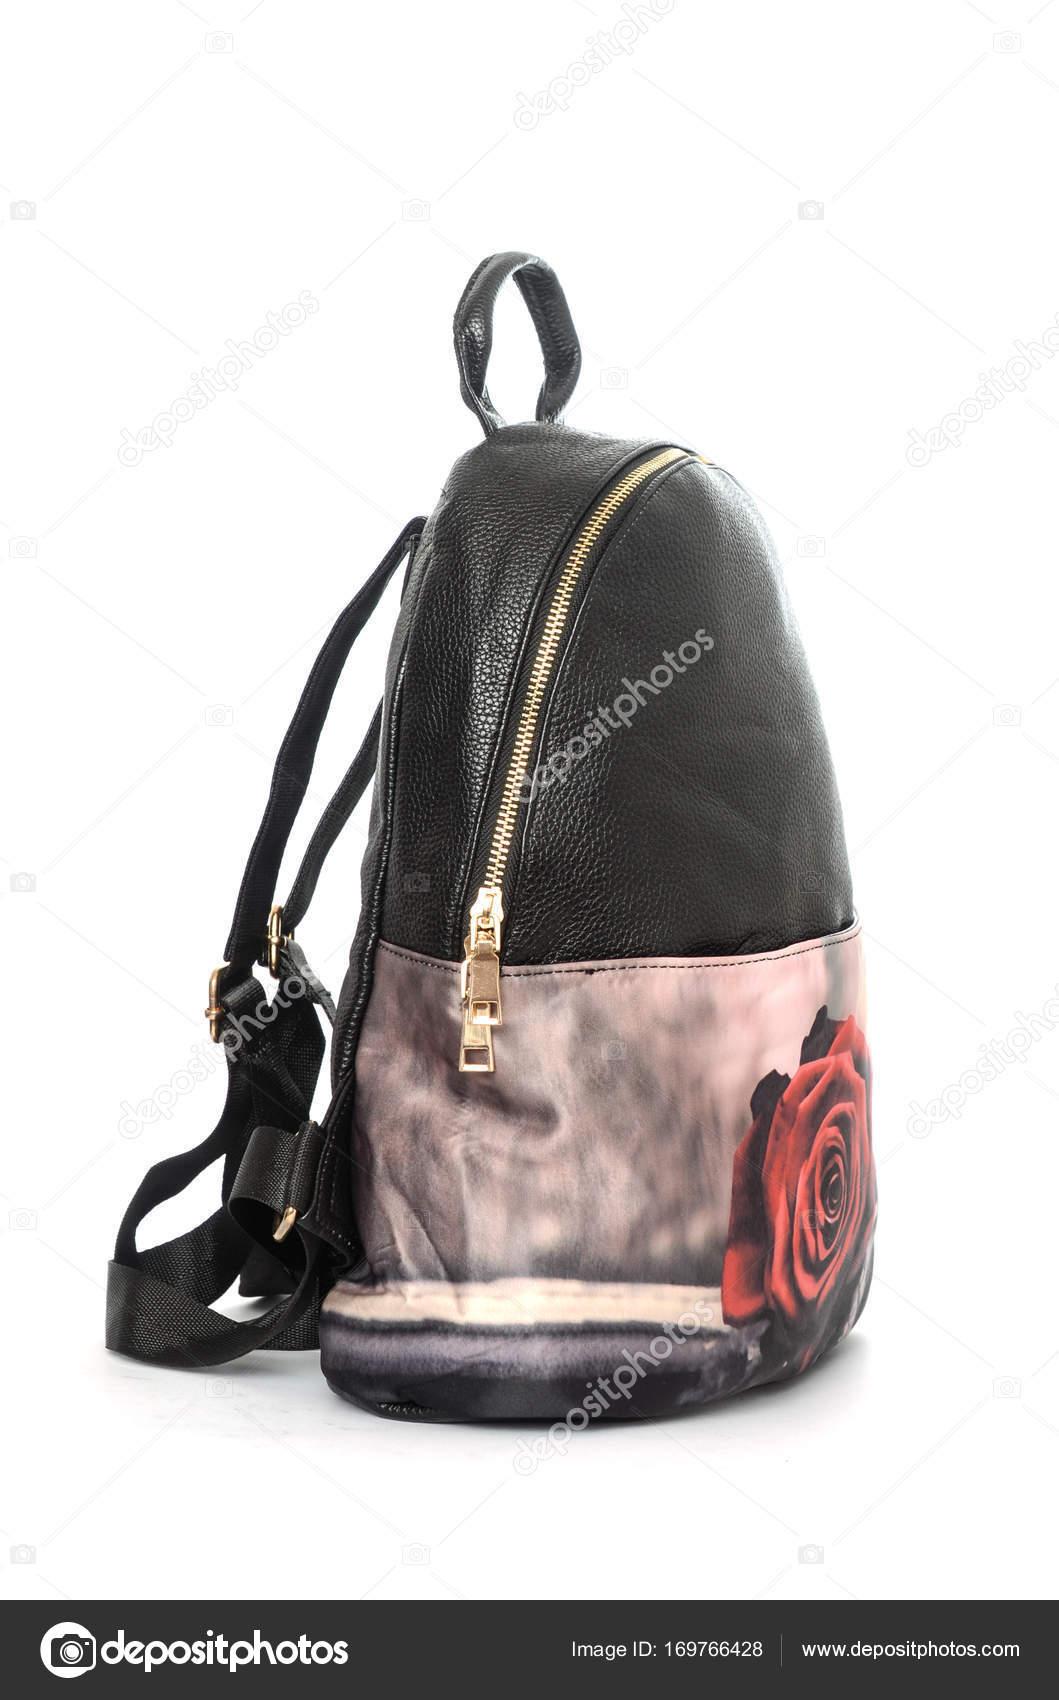 5633def344 Σακίδιο πλάτης μαύρο δέρμα με ροζ print απομονωθεί σε λευκό — Εικόνα από ...